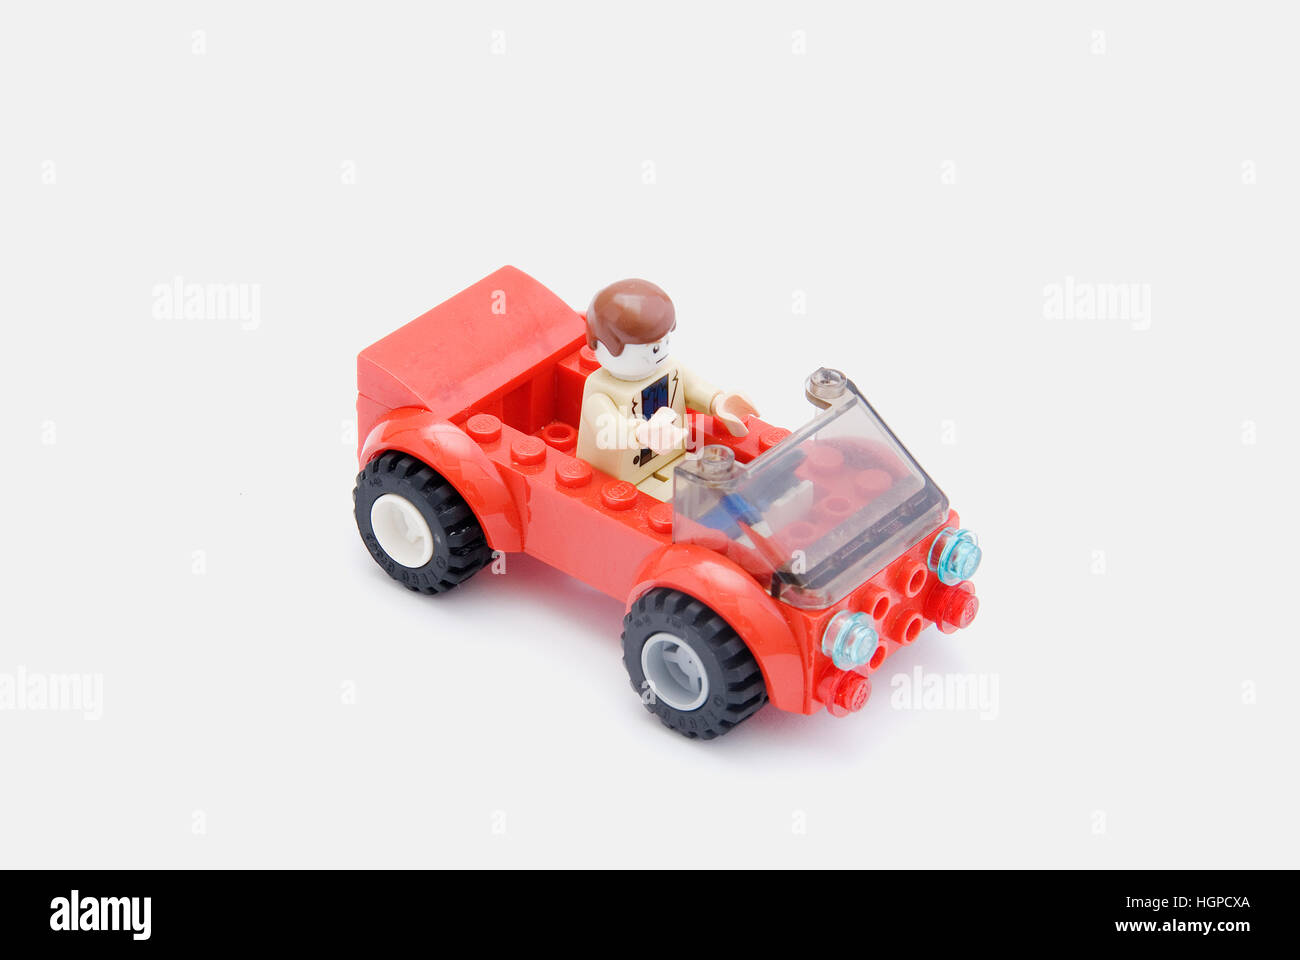 Mini figure Lego driving a car - Stock Image